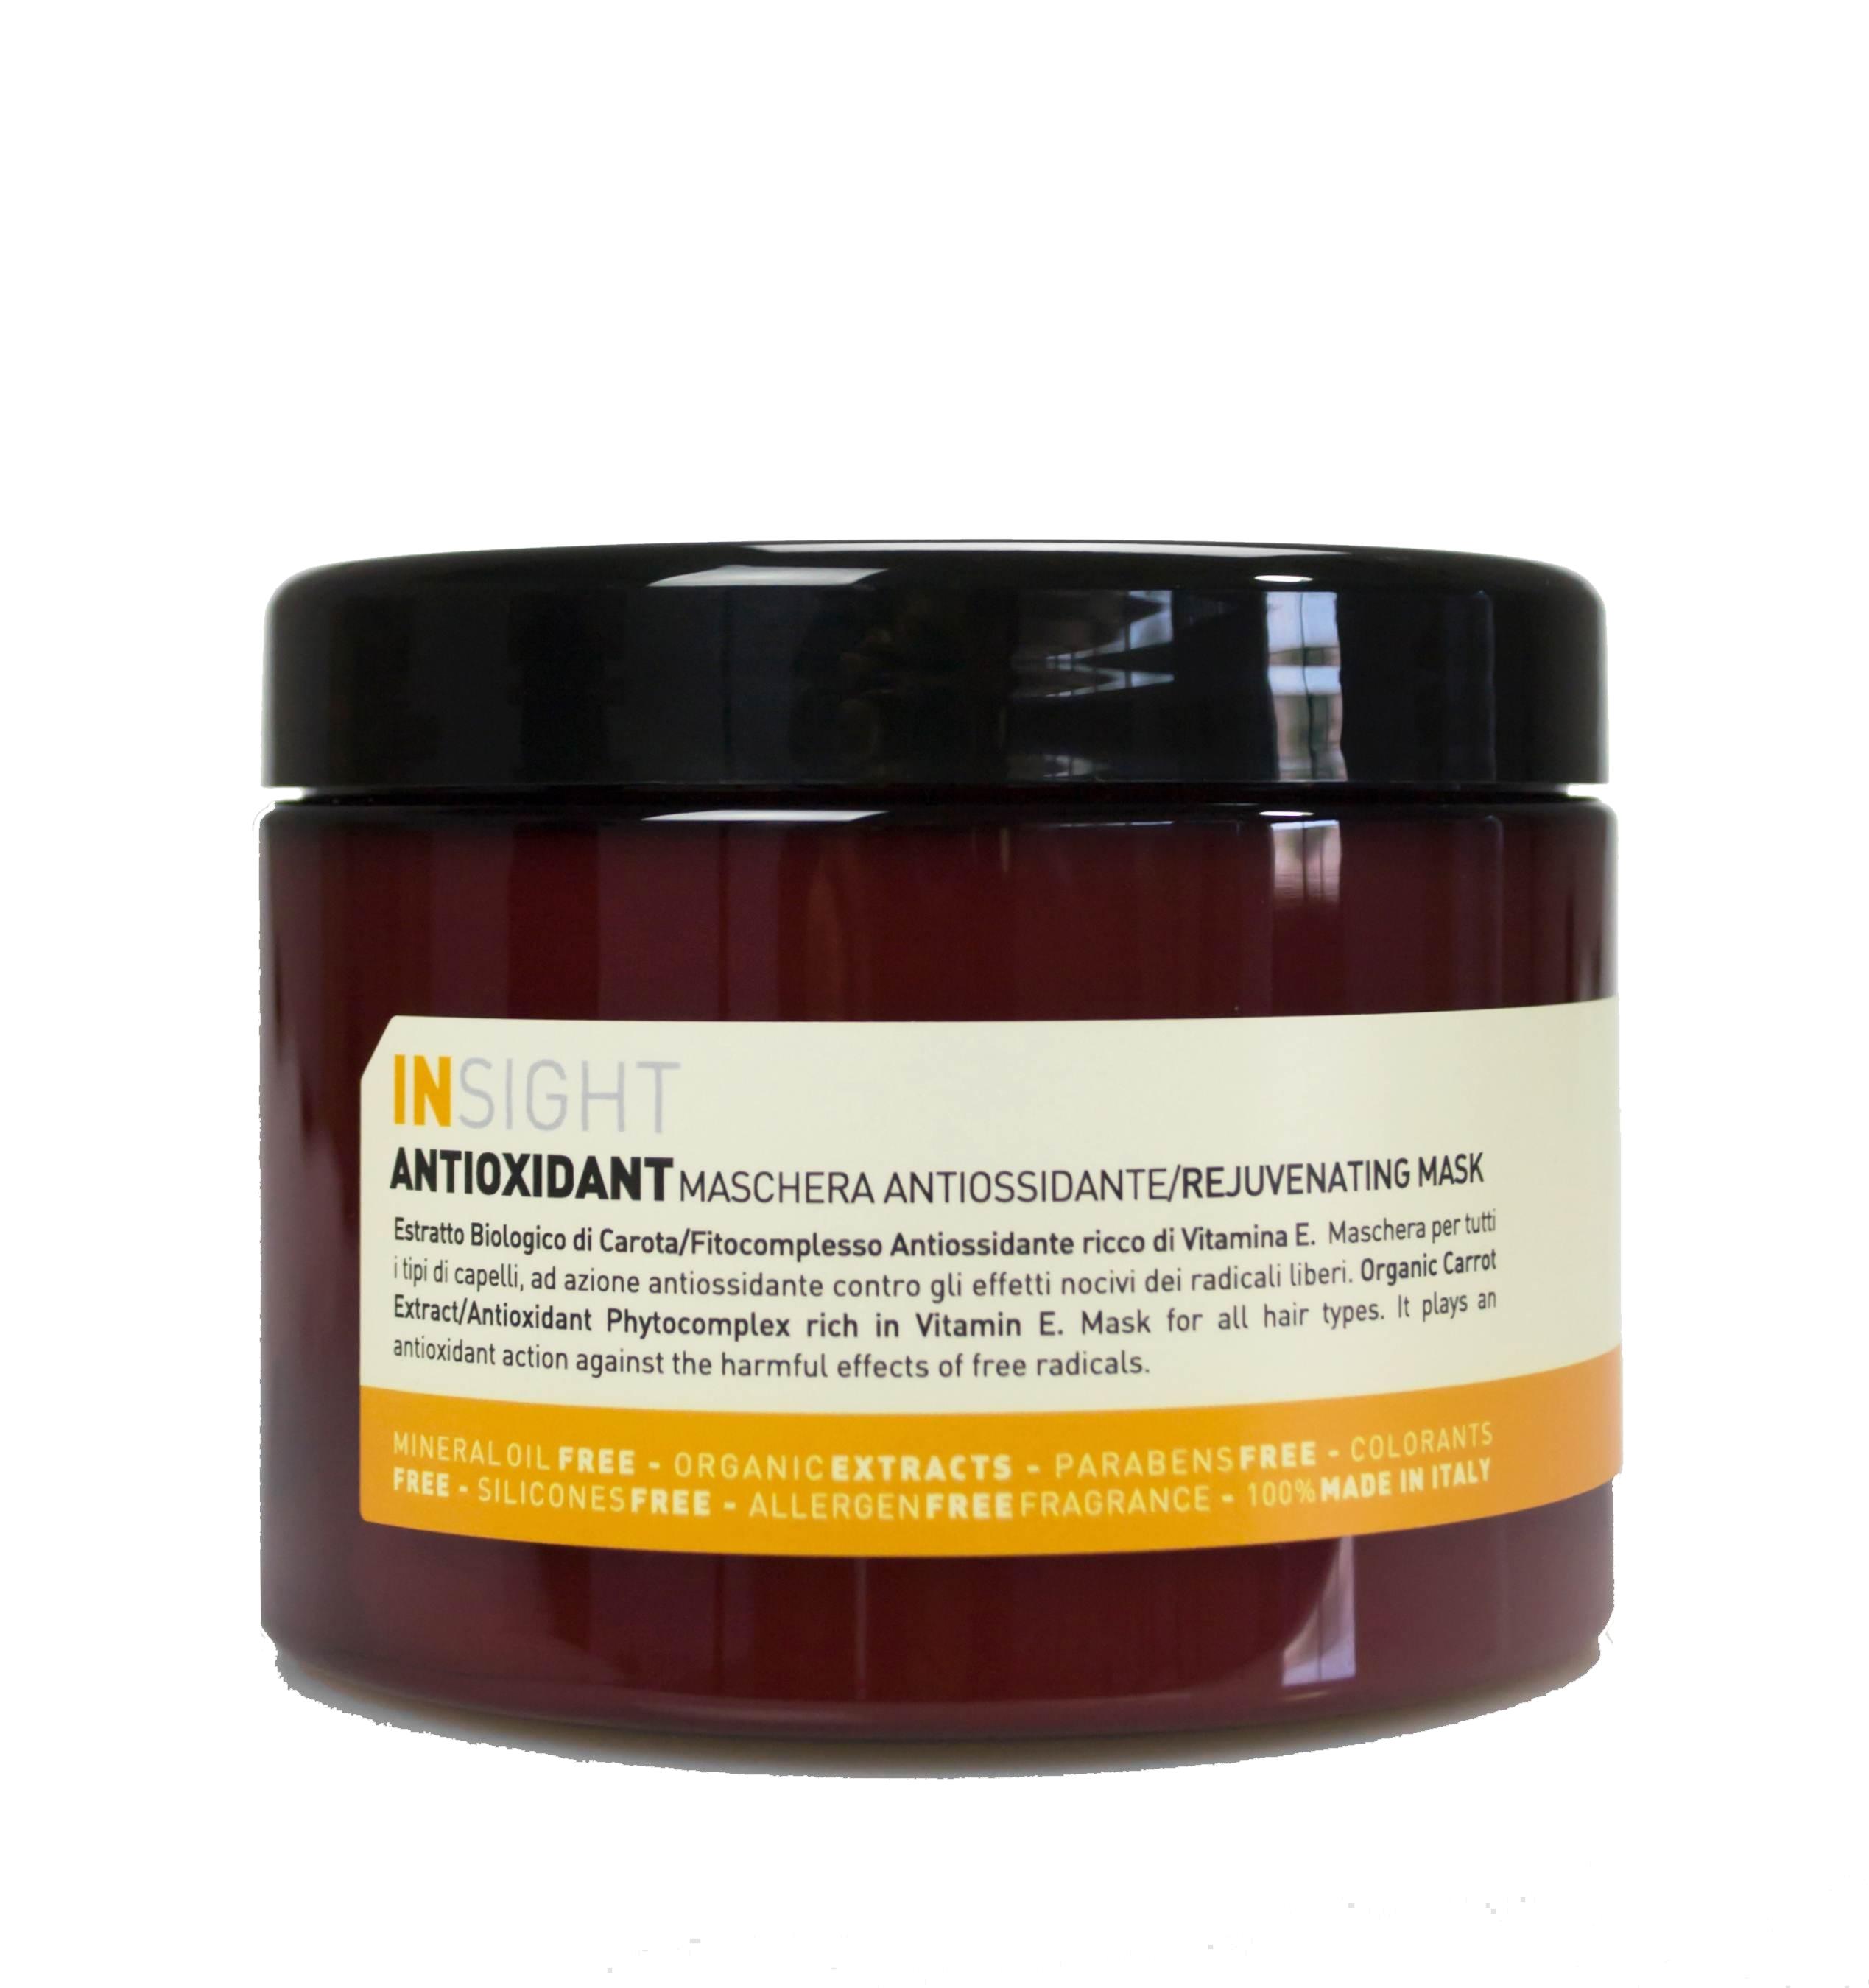 INSIGHT Antioxidant Rejuvenating Maske 500 ml